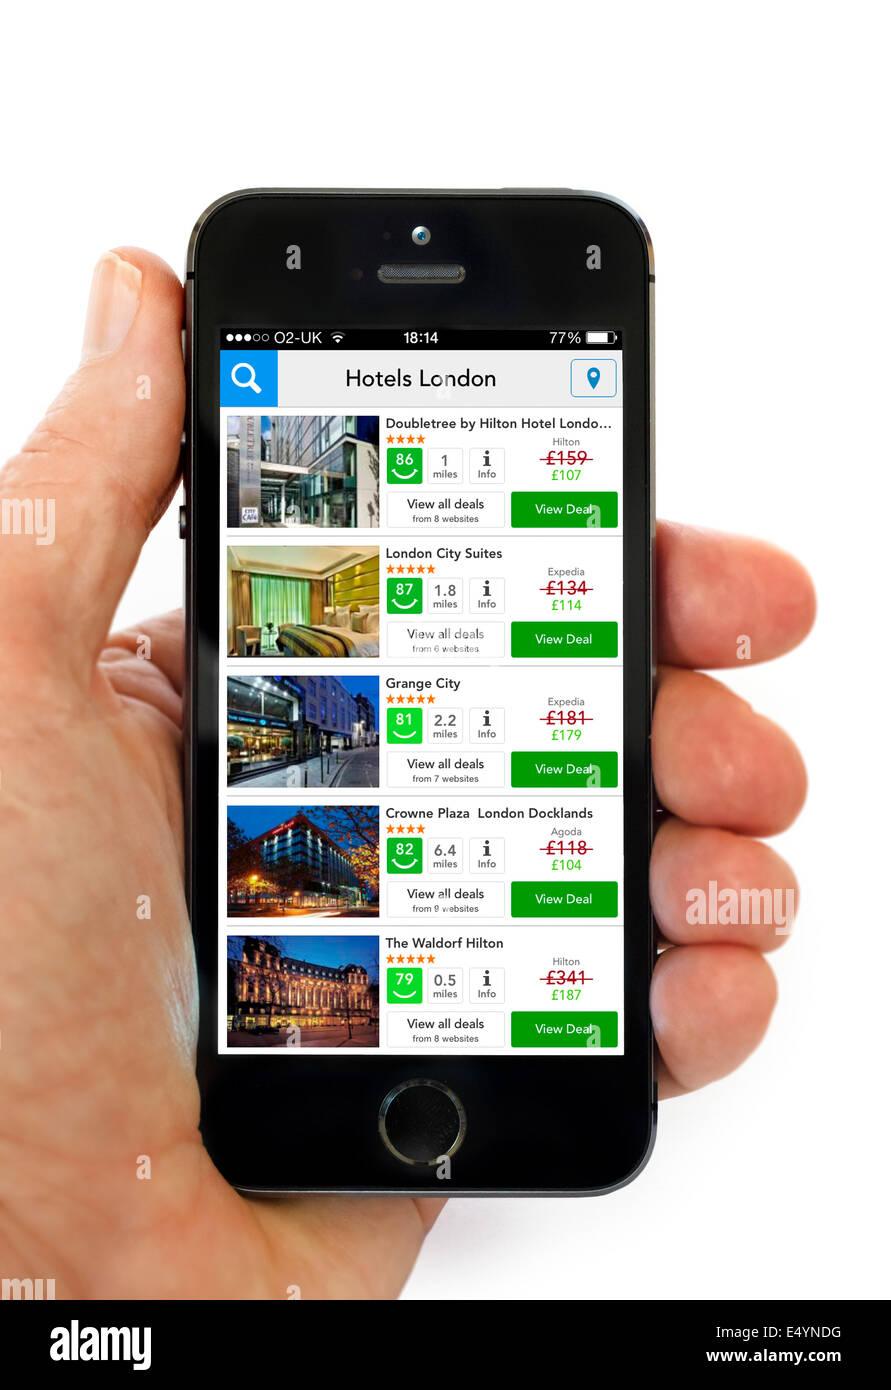 Price Comparison App >> Trivago App The Hotel Price Comparison Tool On An Apple